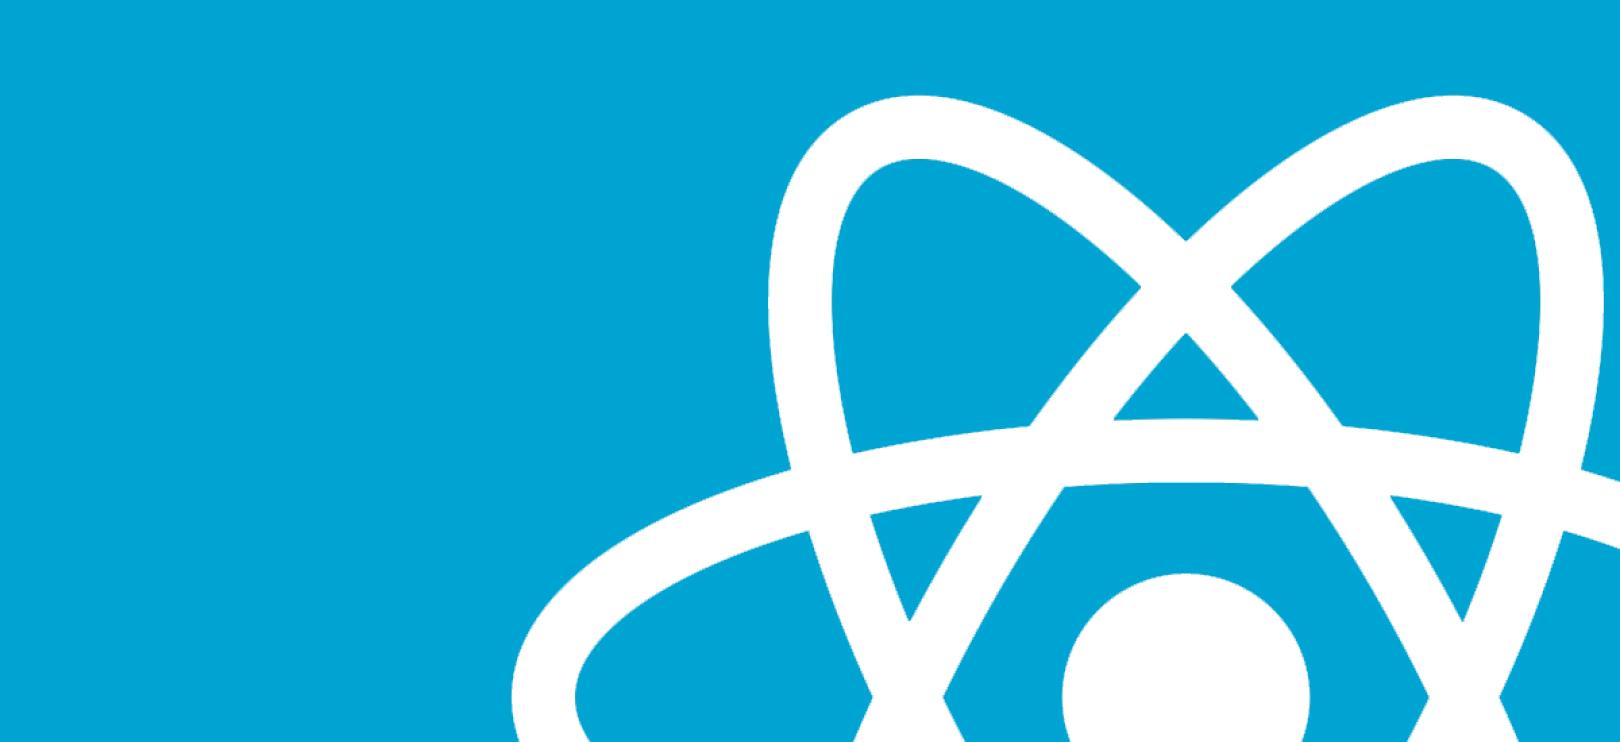 image 9 3 - React Native is the popular cross-platform framework